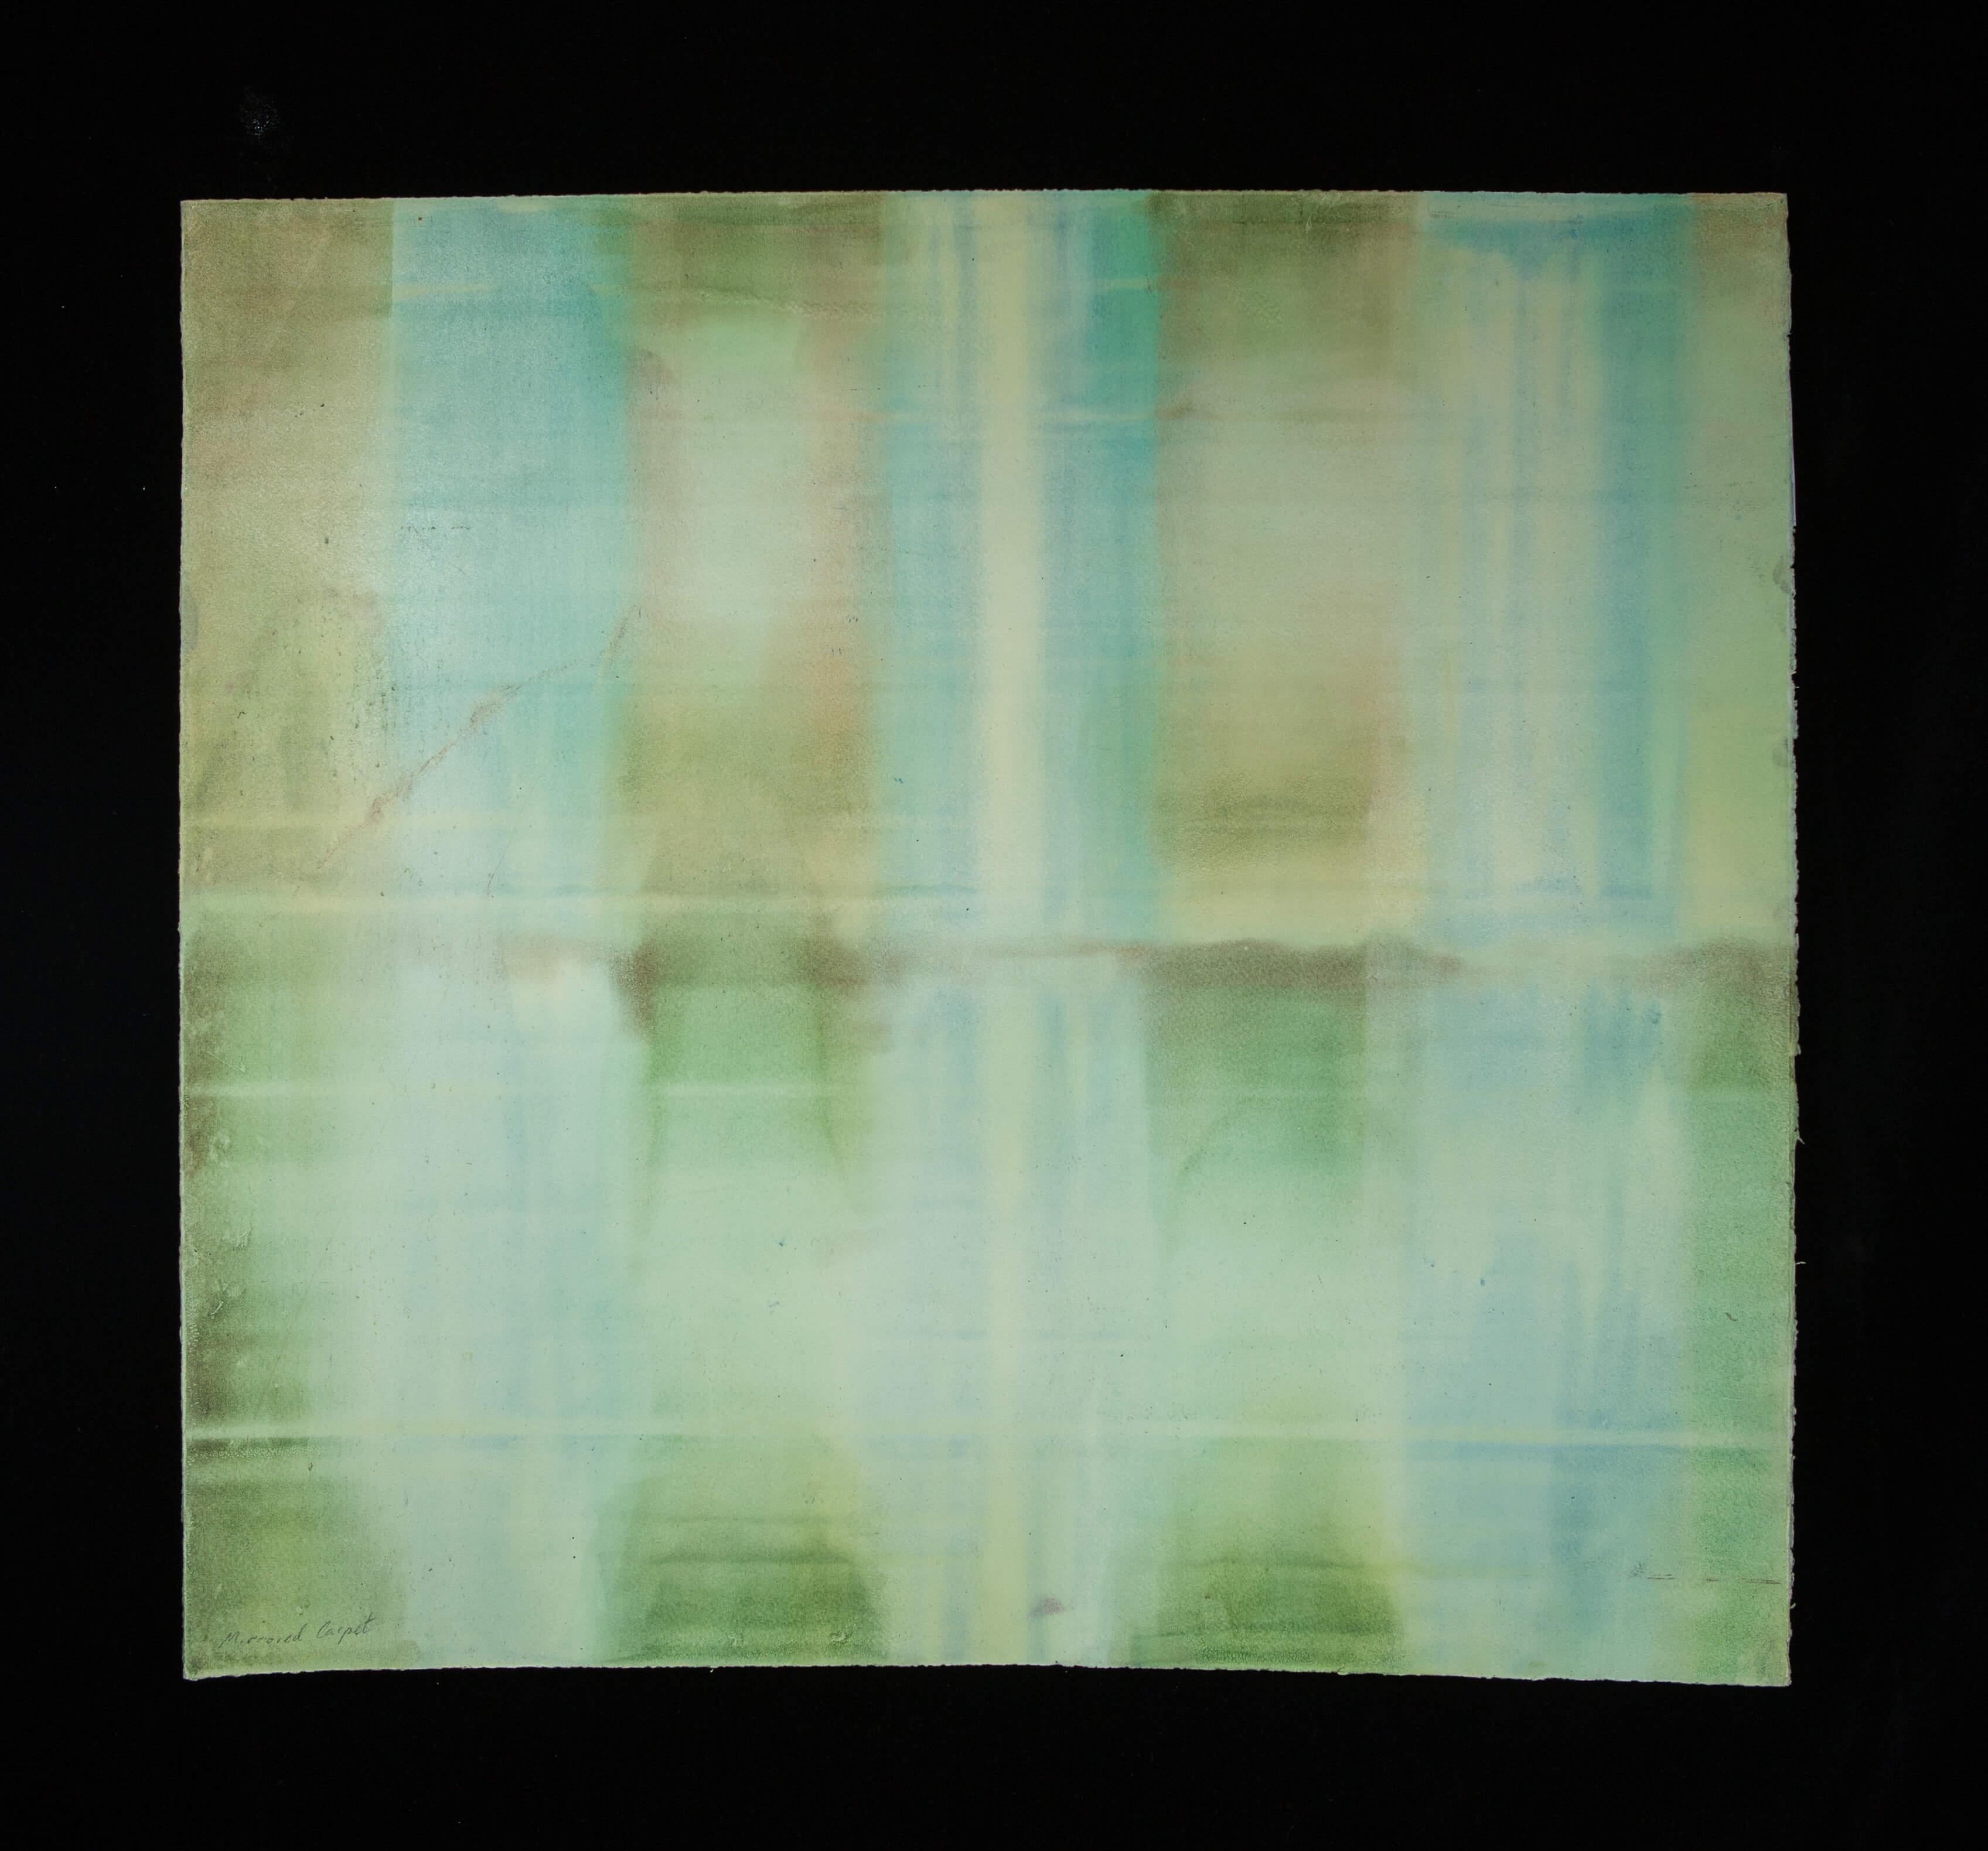 Mirrored Carpet, 2012